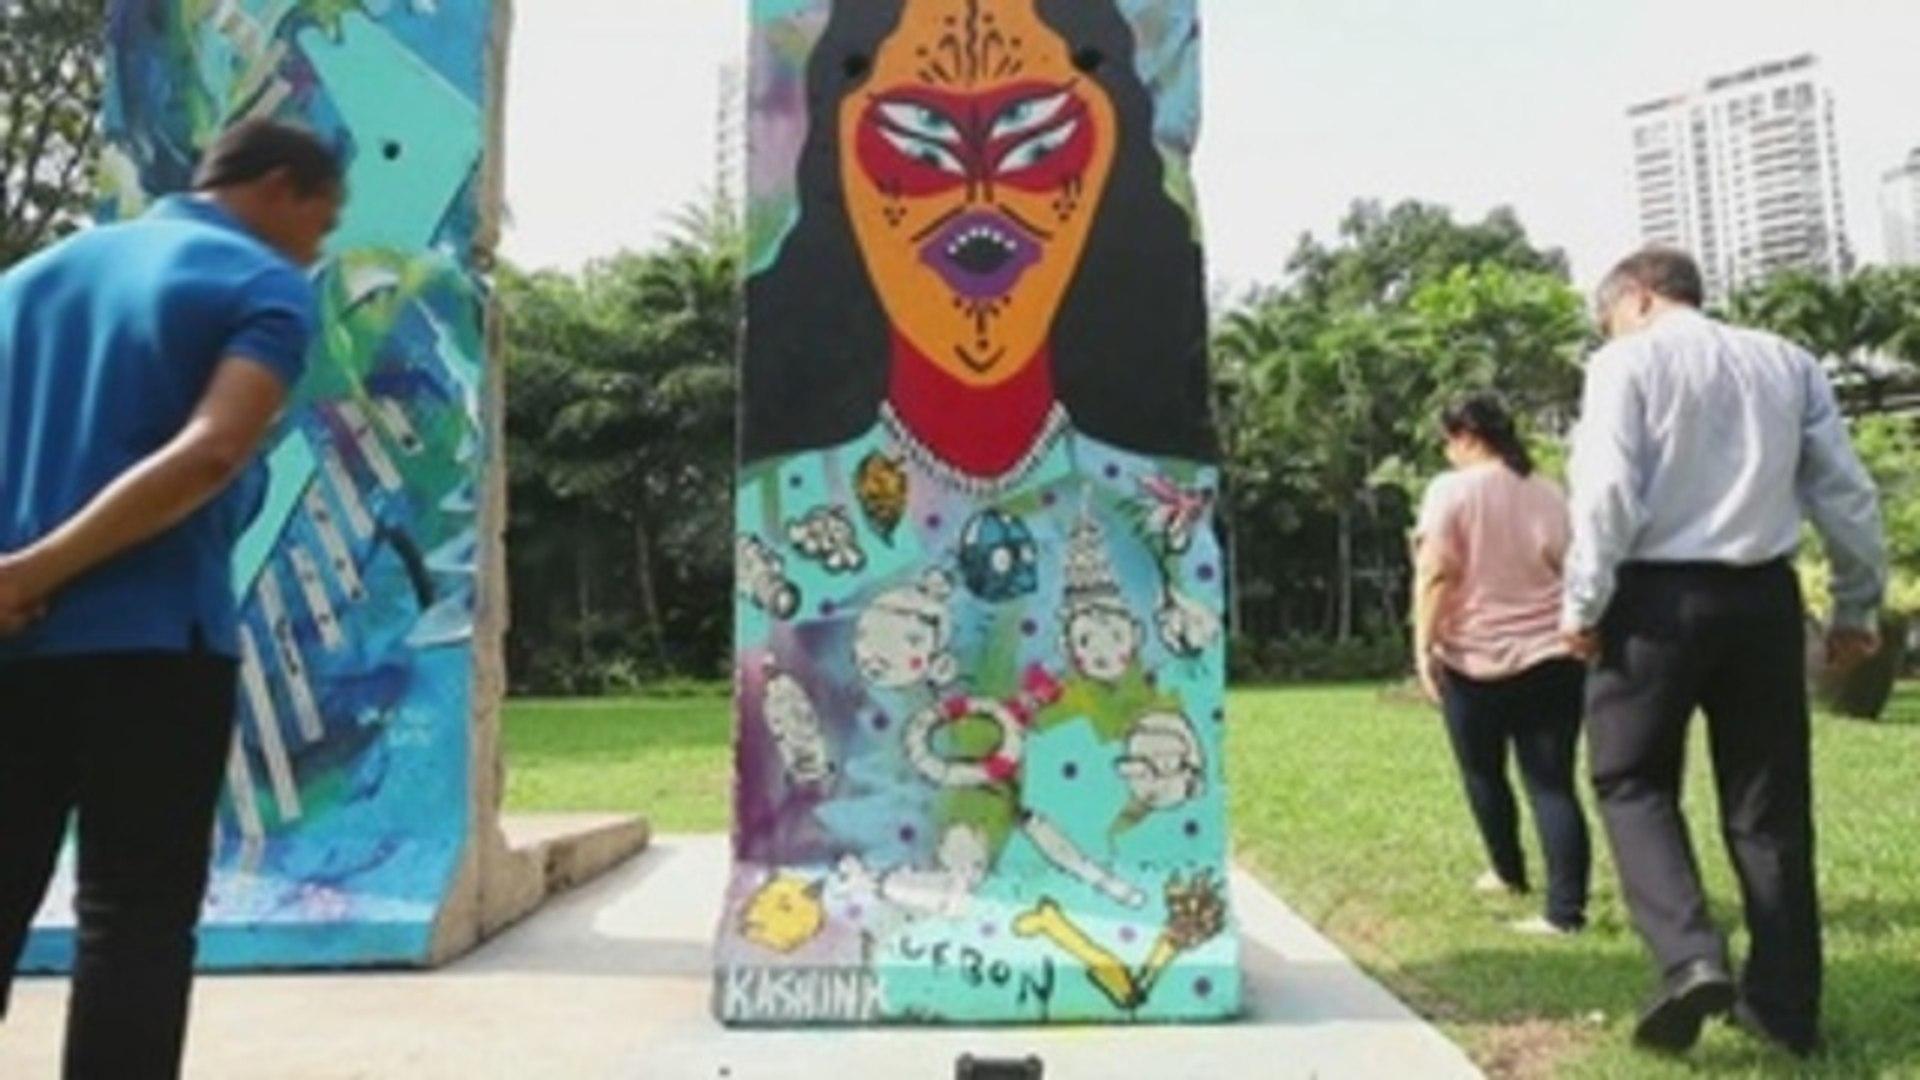 Bangkok exhibe dos segmentos del muro de Berlín renovados con arte callejero